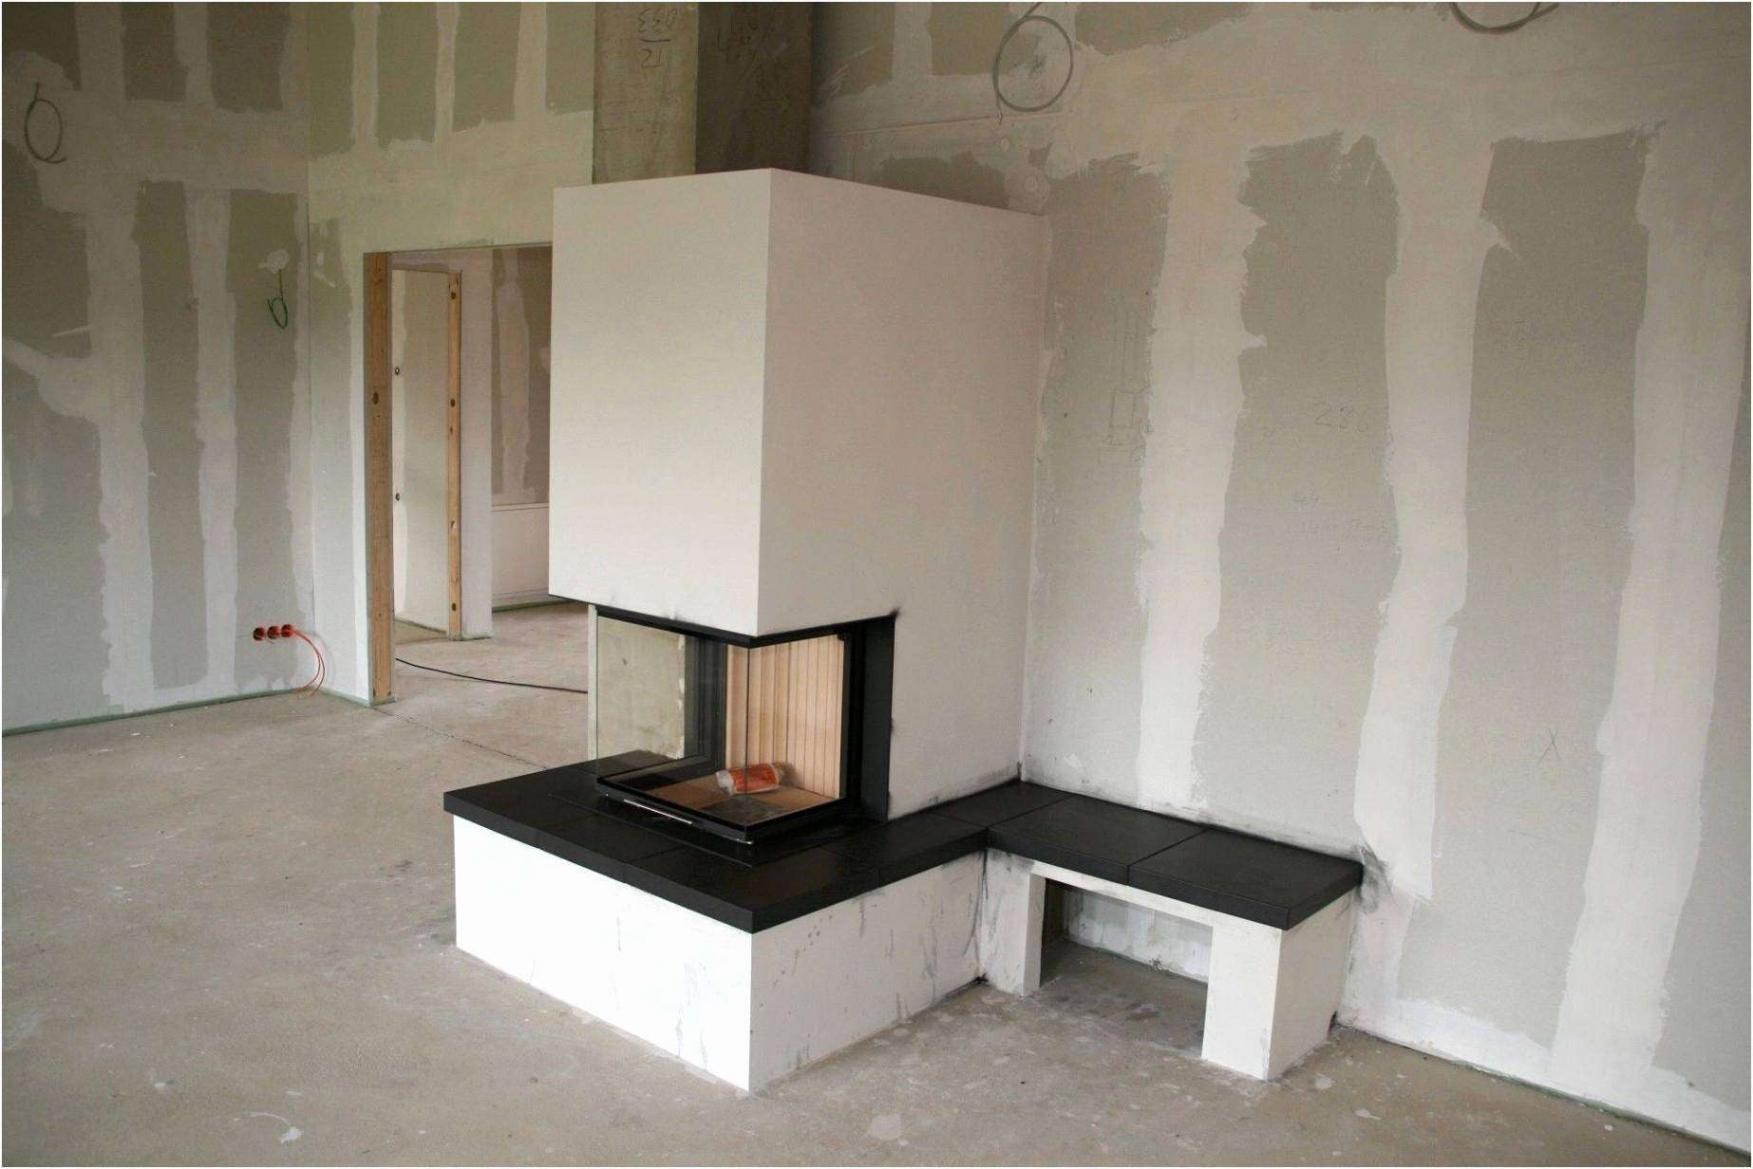 45 luxus deko ideen kuche galerie kuchen fur dachgeschosswohnungen kuchen fur dachgeschosswohnungen 9